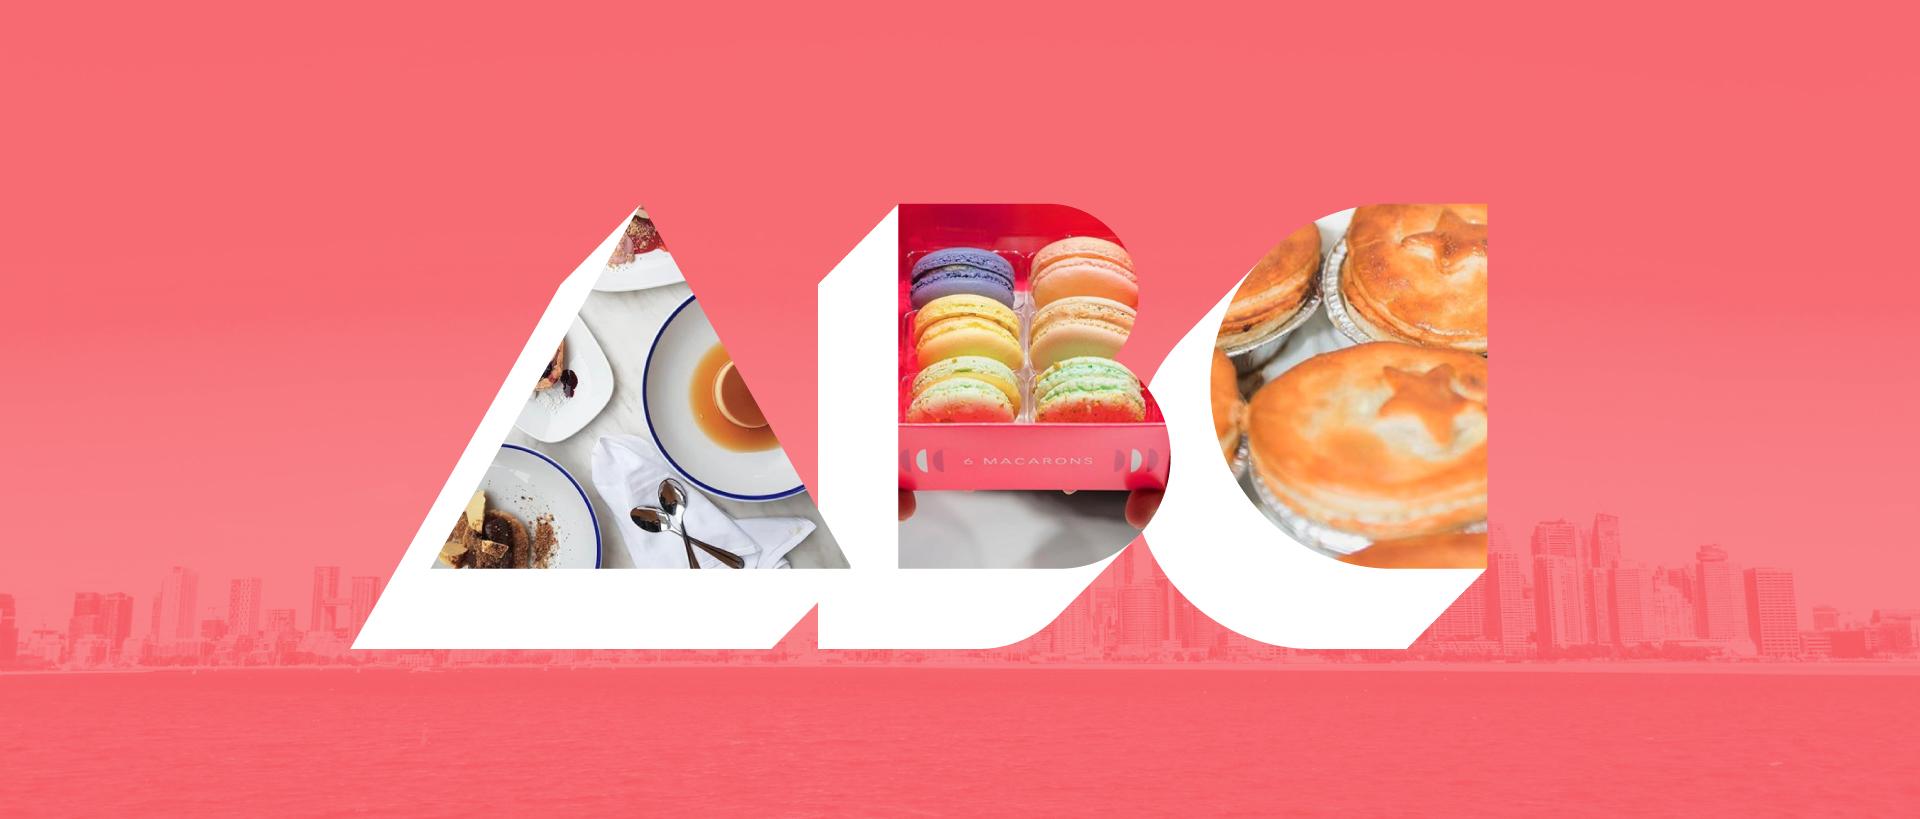 The ABCs of the Toronto Food Scene